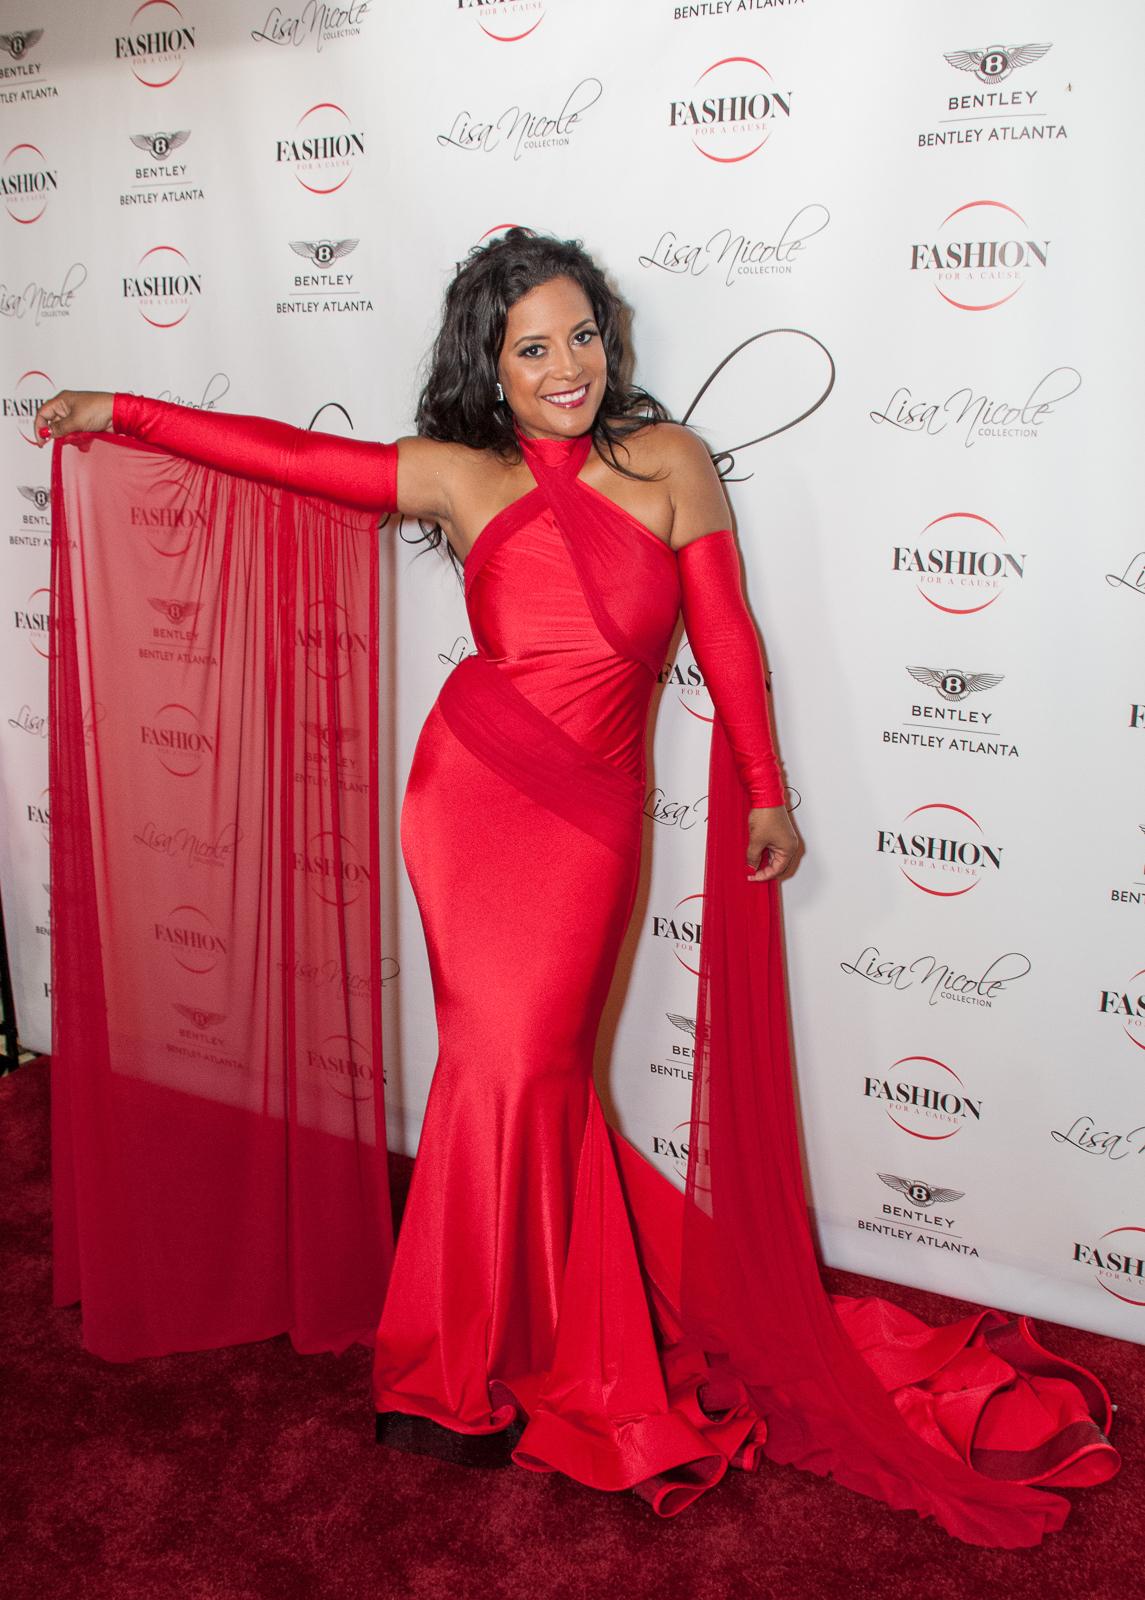 Lisa Nicole Cloud's 'Fashion For A Cause' Runway Show